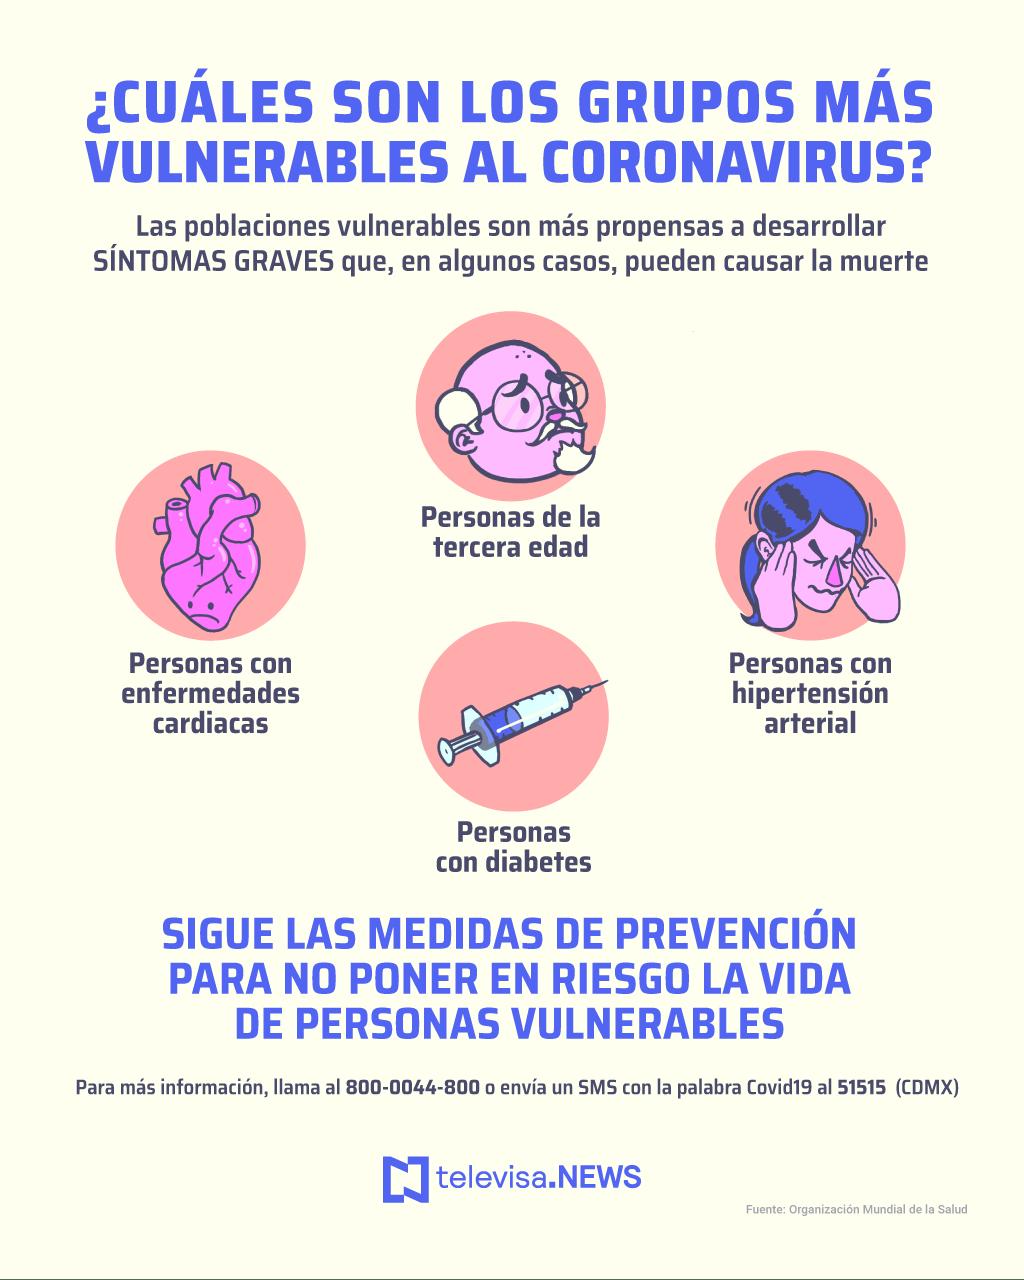 Grupos-vulnerables-ancianos-coronavirus-covid19